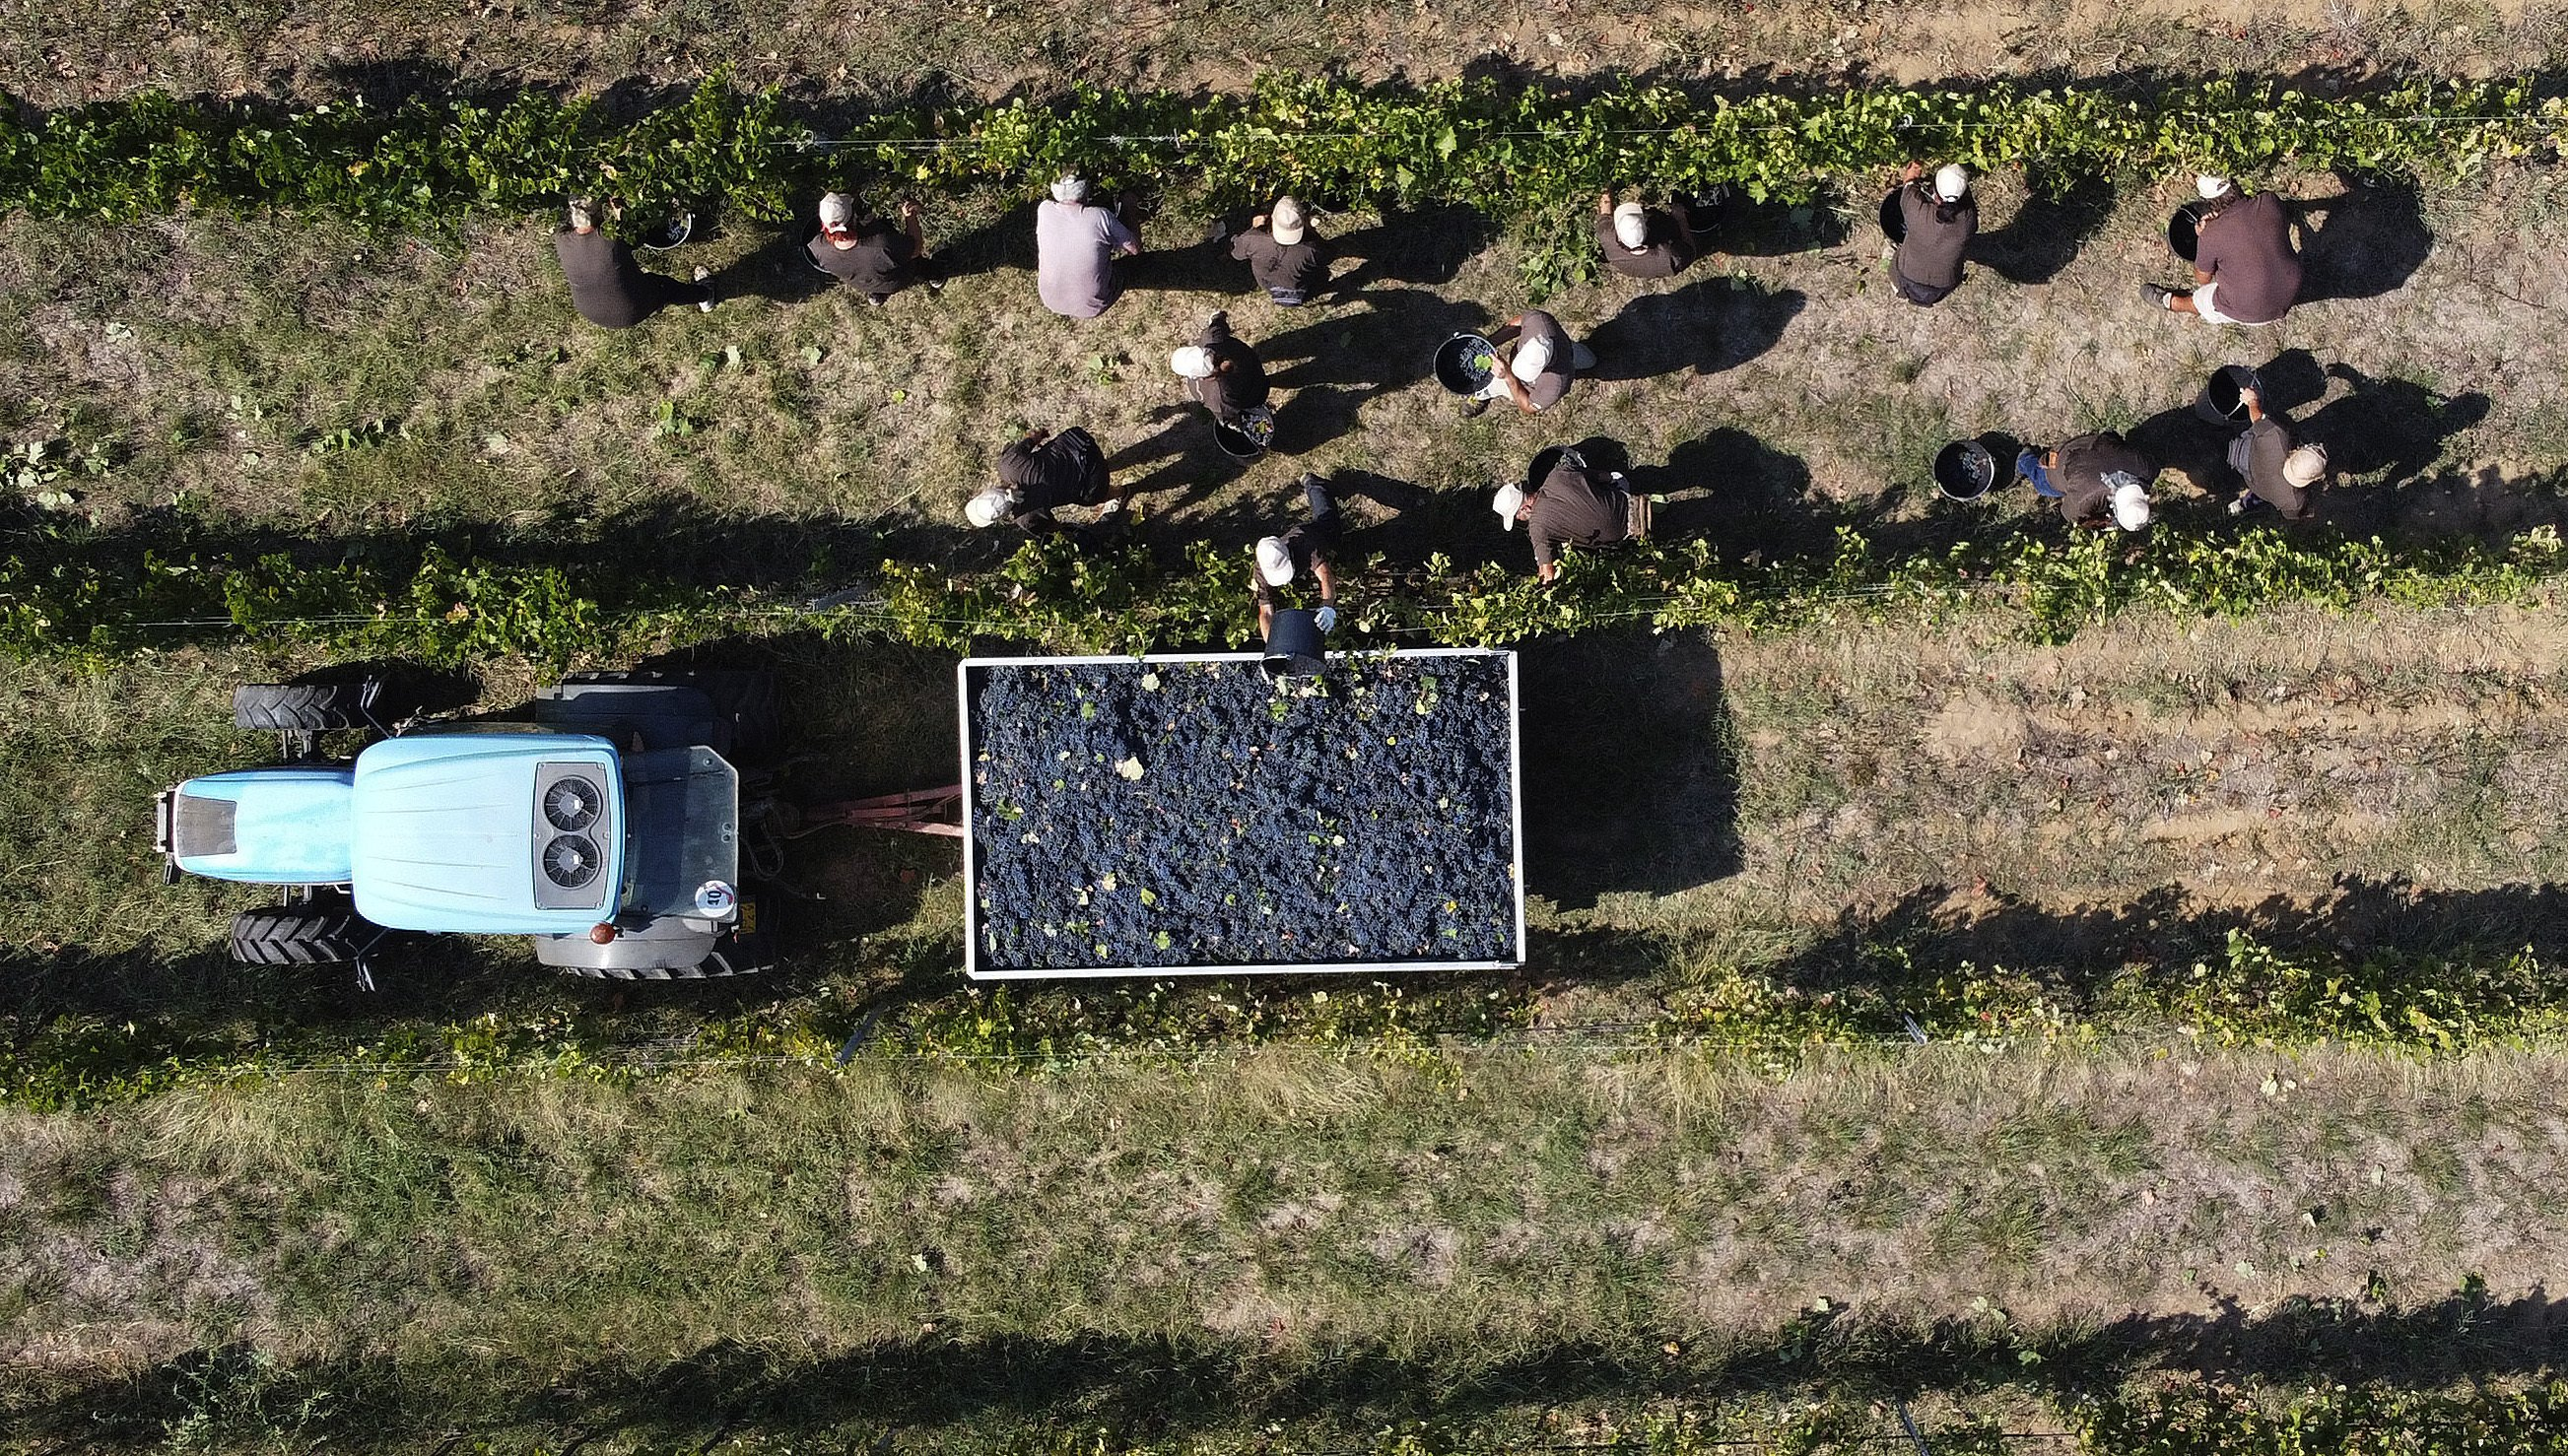 AP PHOTOS: Italian grape harvest plows on through pandemic